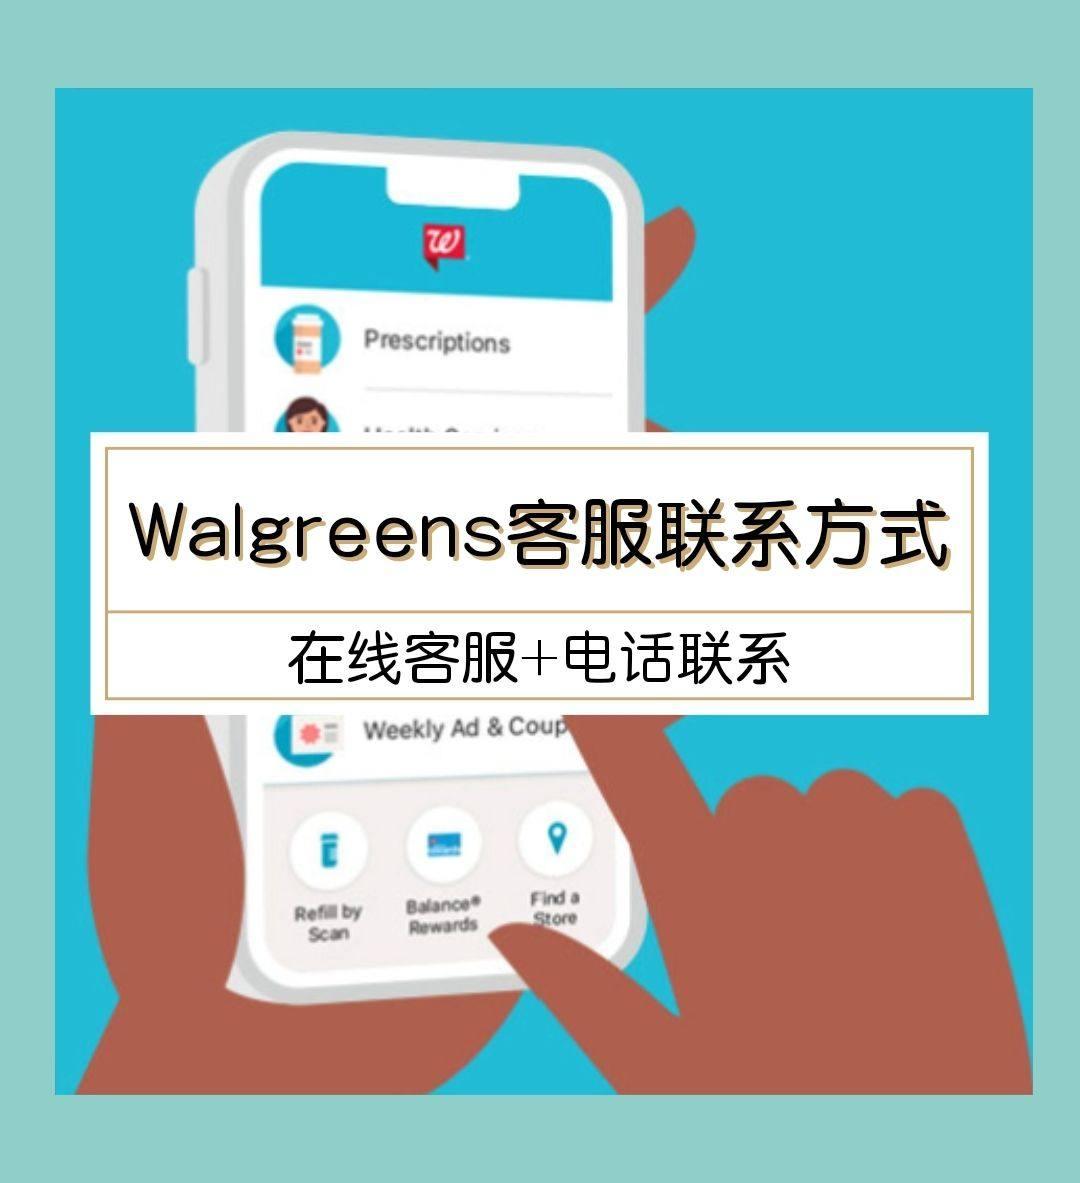 Walgreens沃尔格林网站怎么联系客服?Walgreen